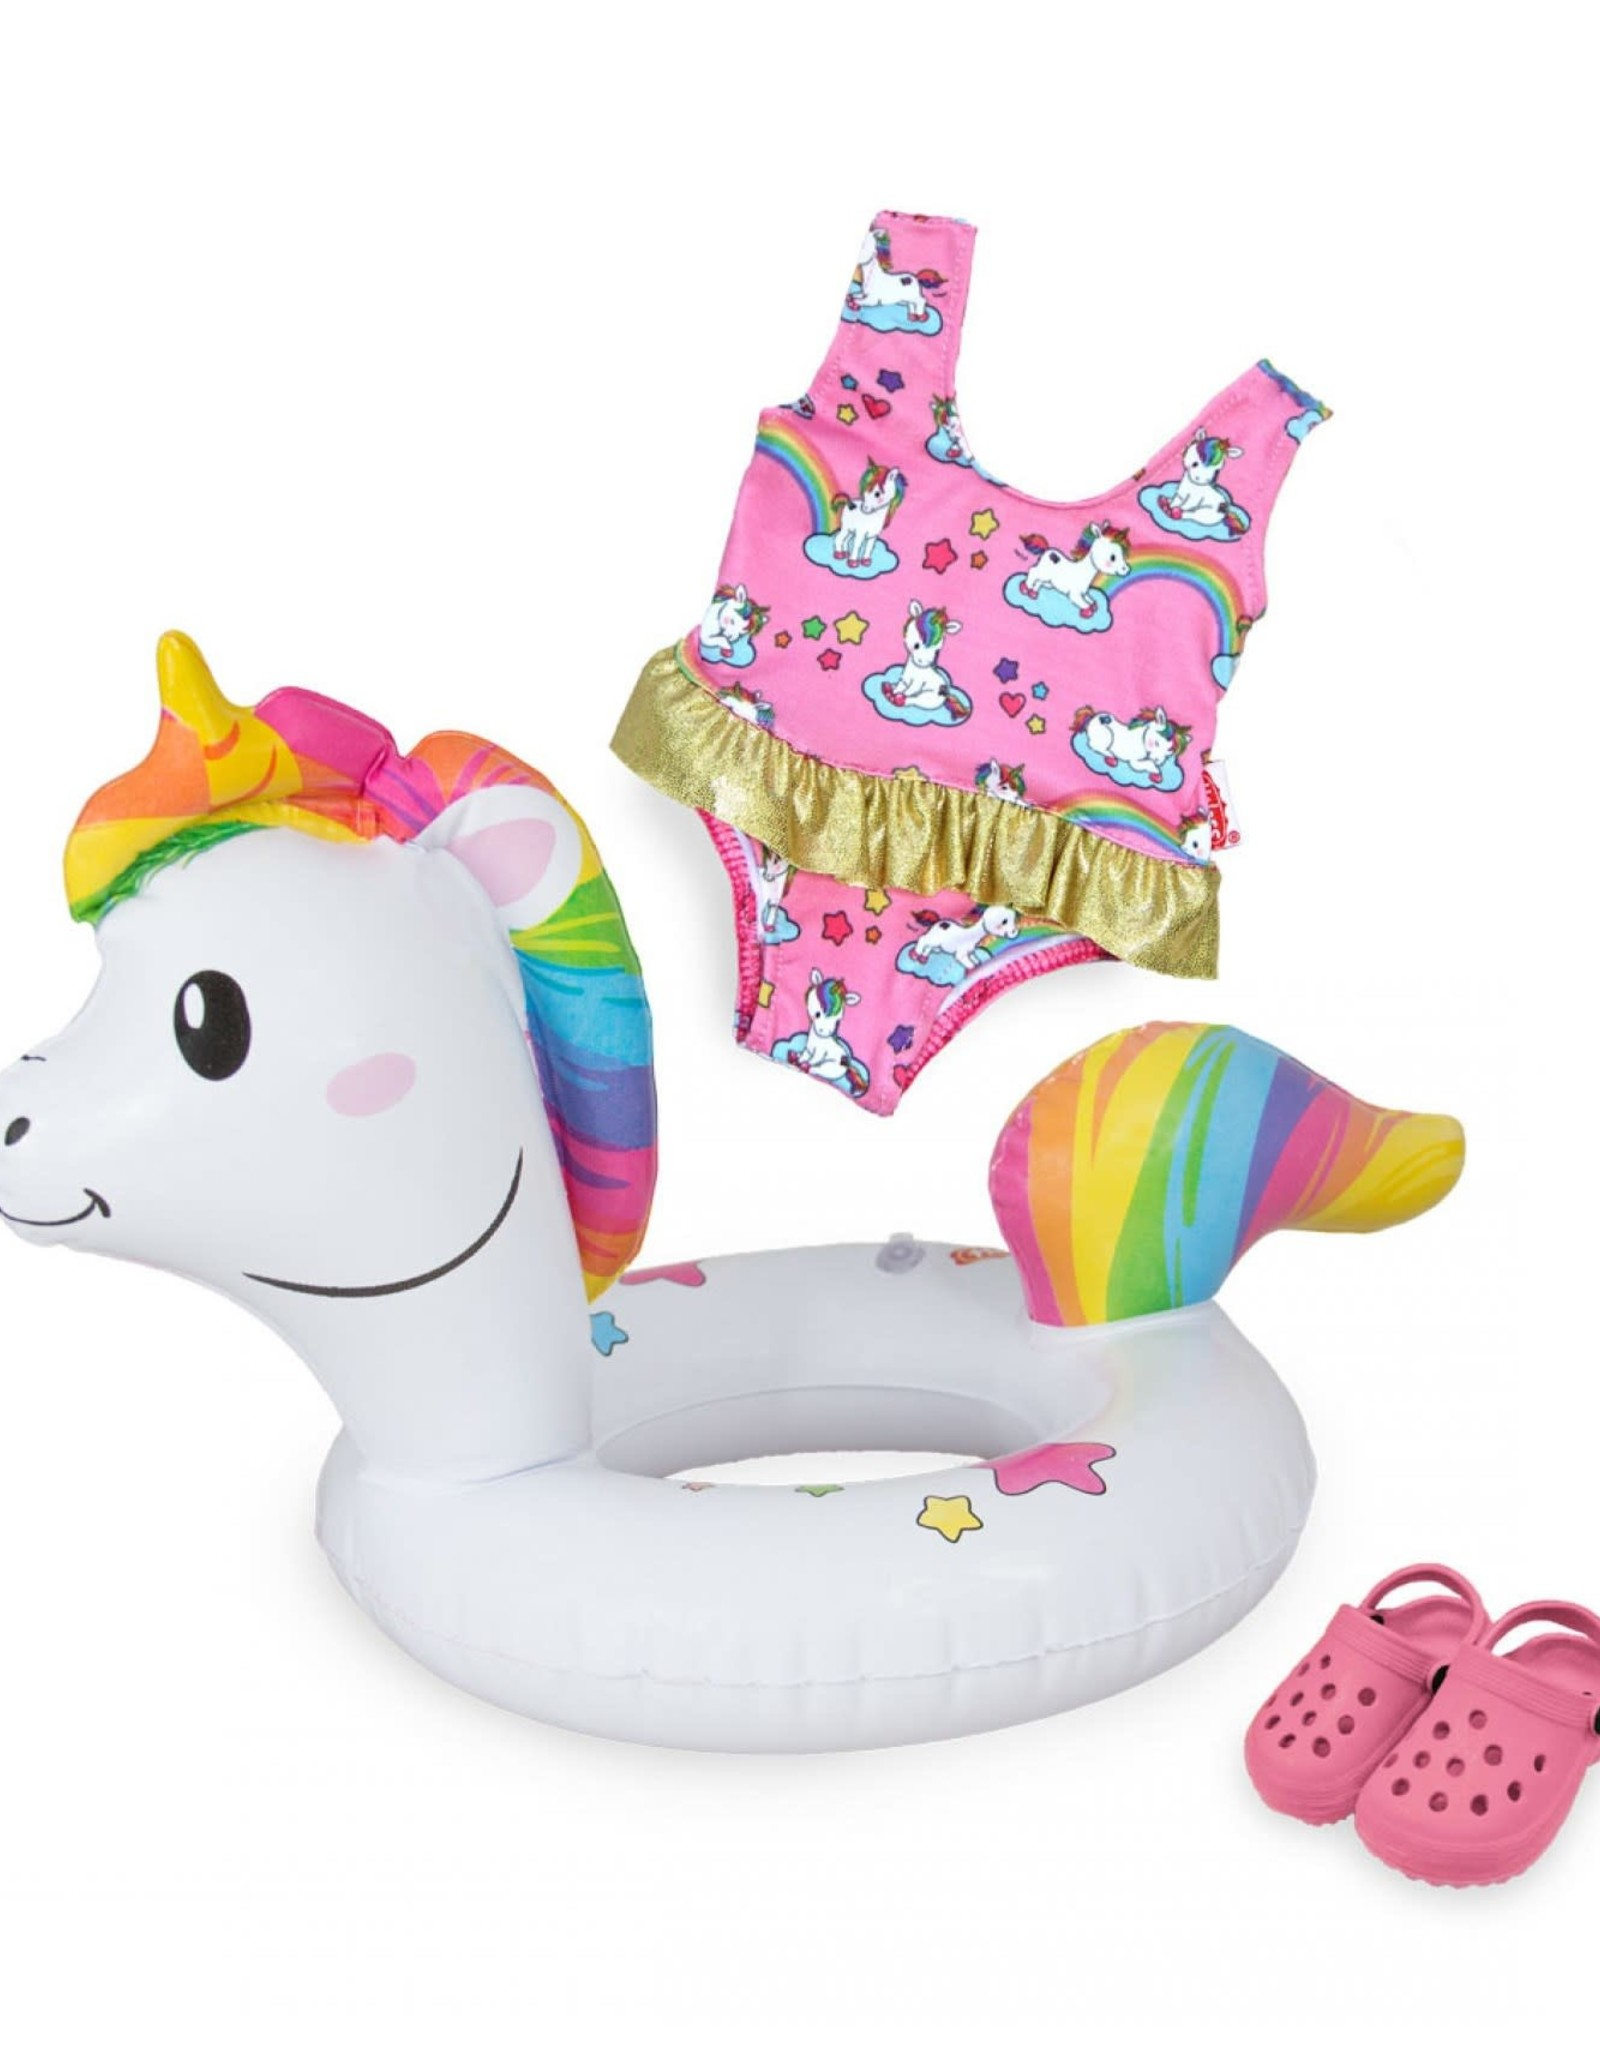 Heless Heless Unicorn zwemset